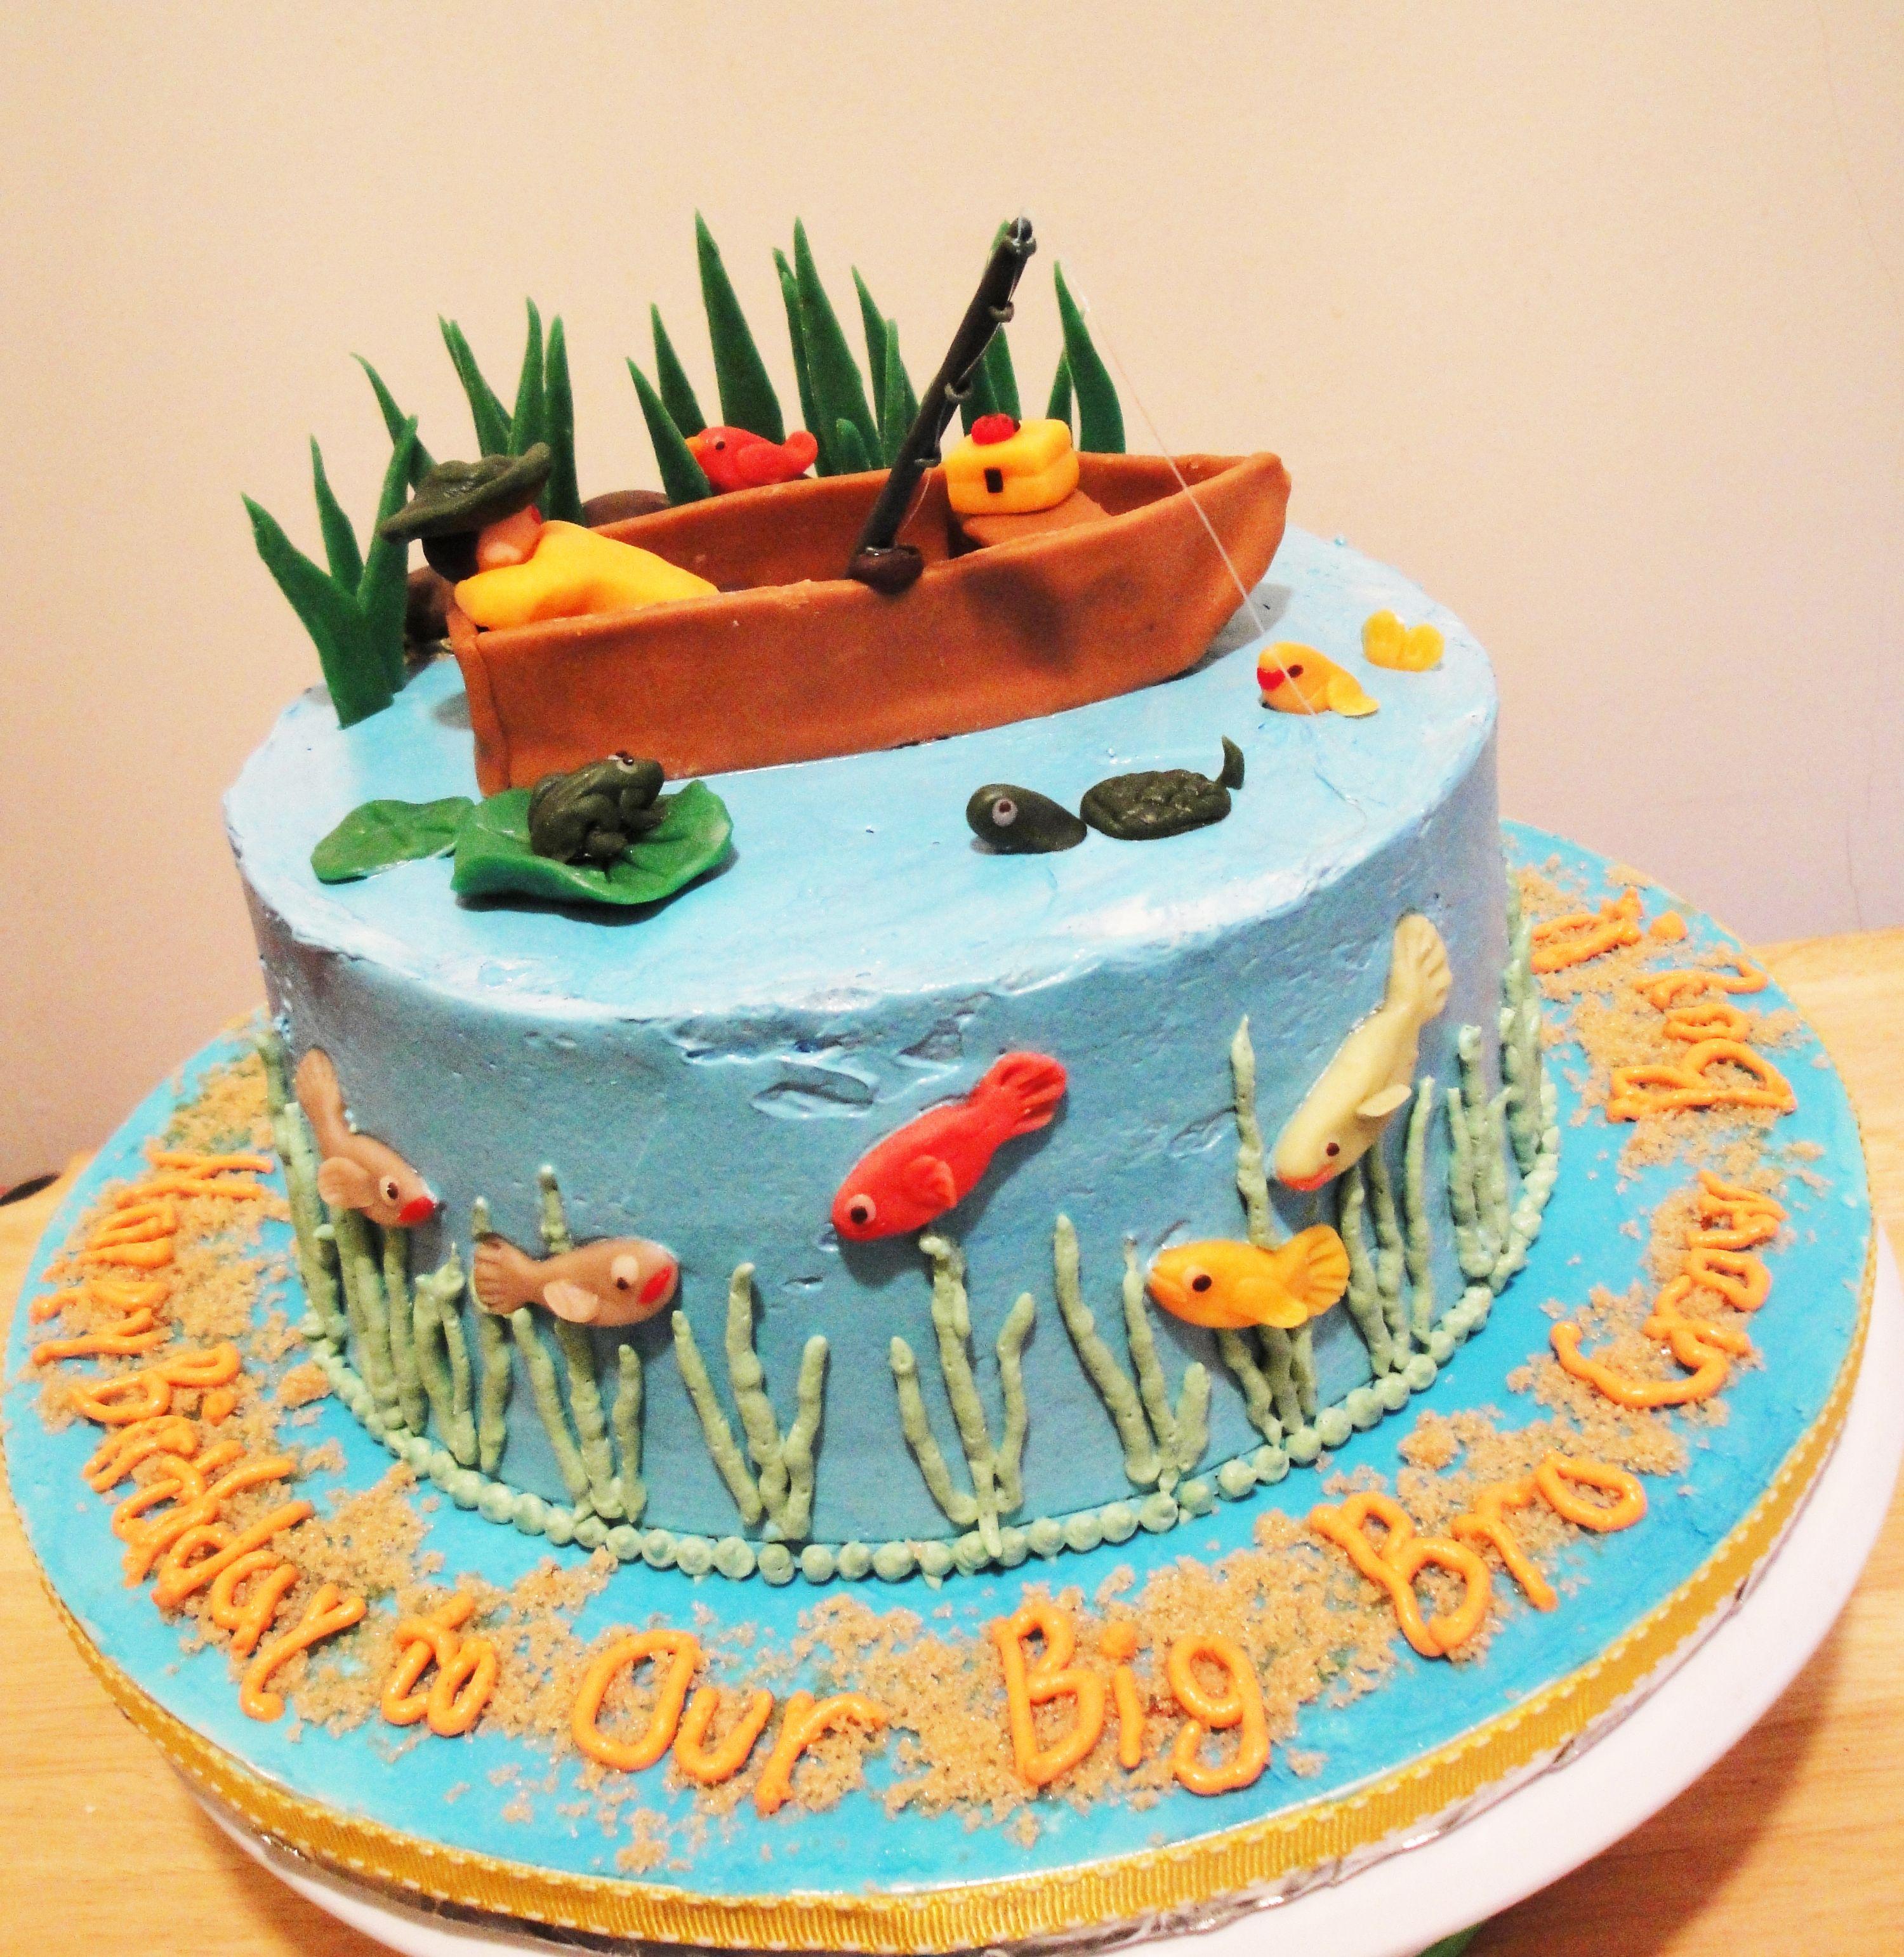 Gone Fishing Birthday Cake Tweetealicious Cakes Pinterest - Fishing boat birthday cake